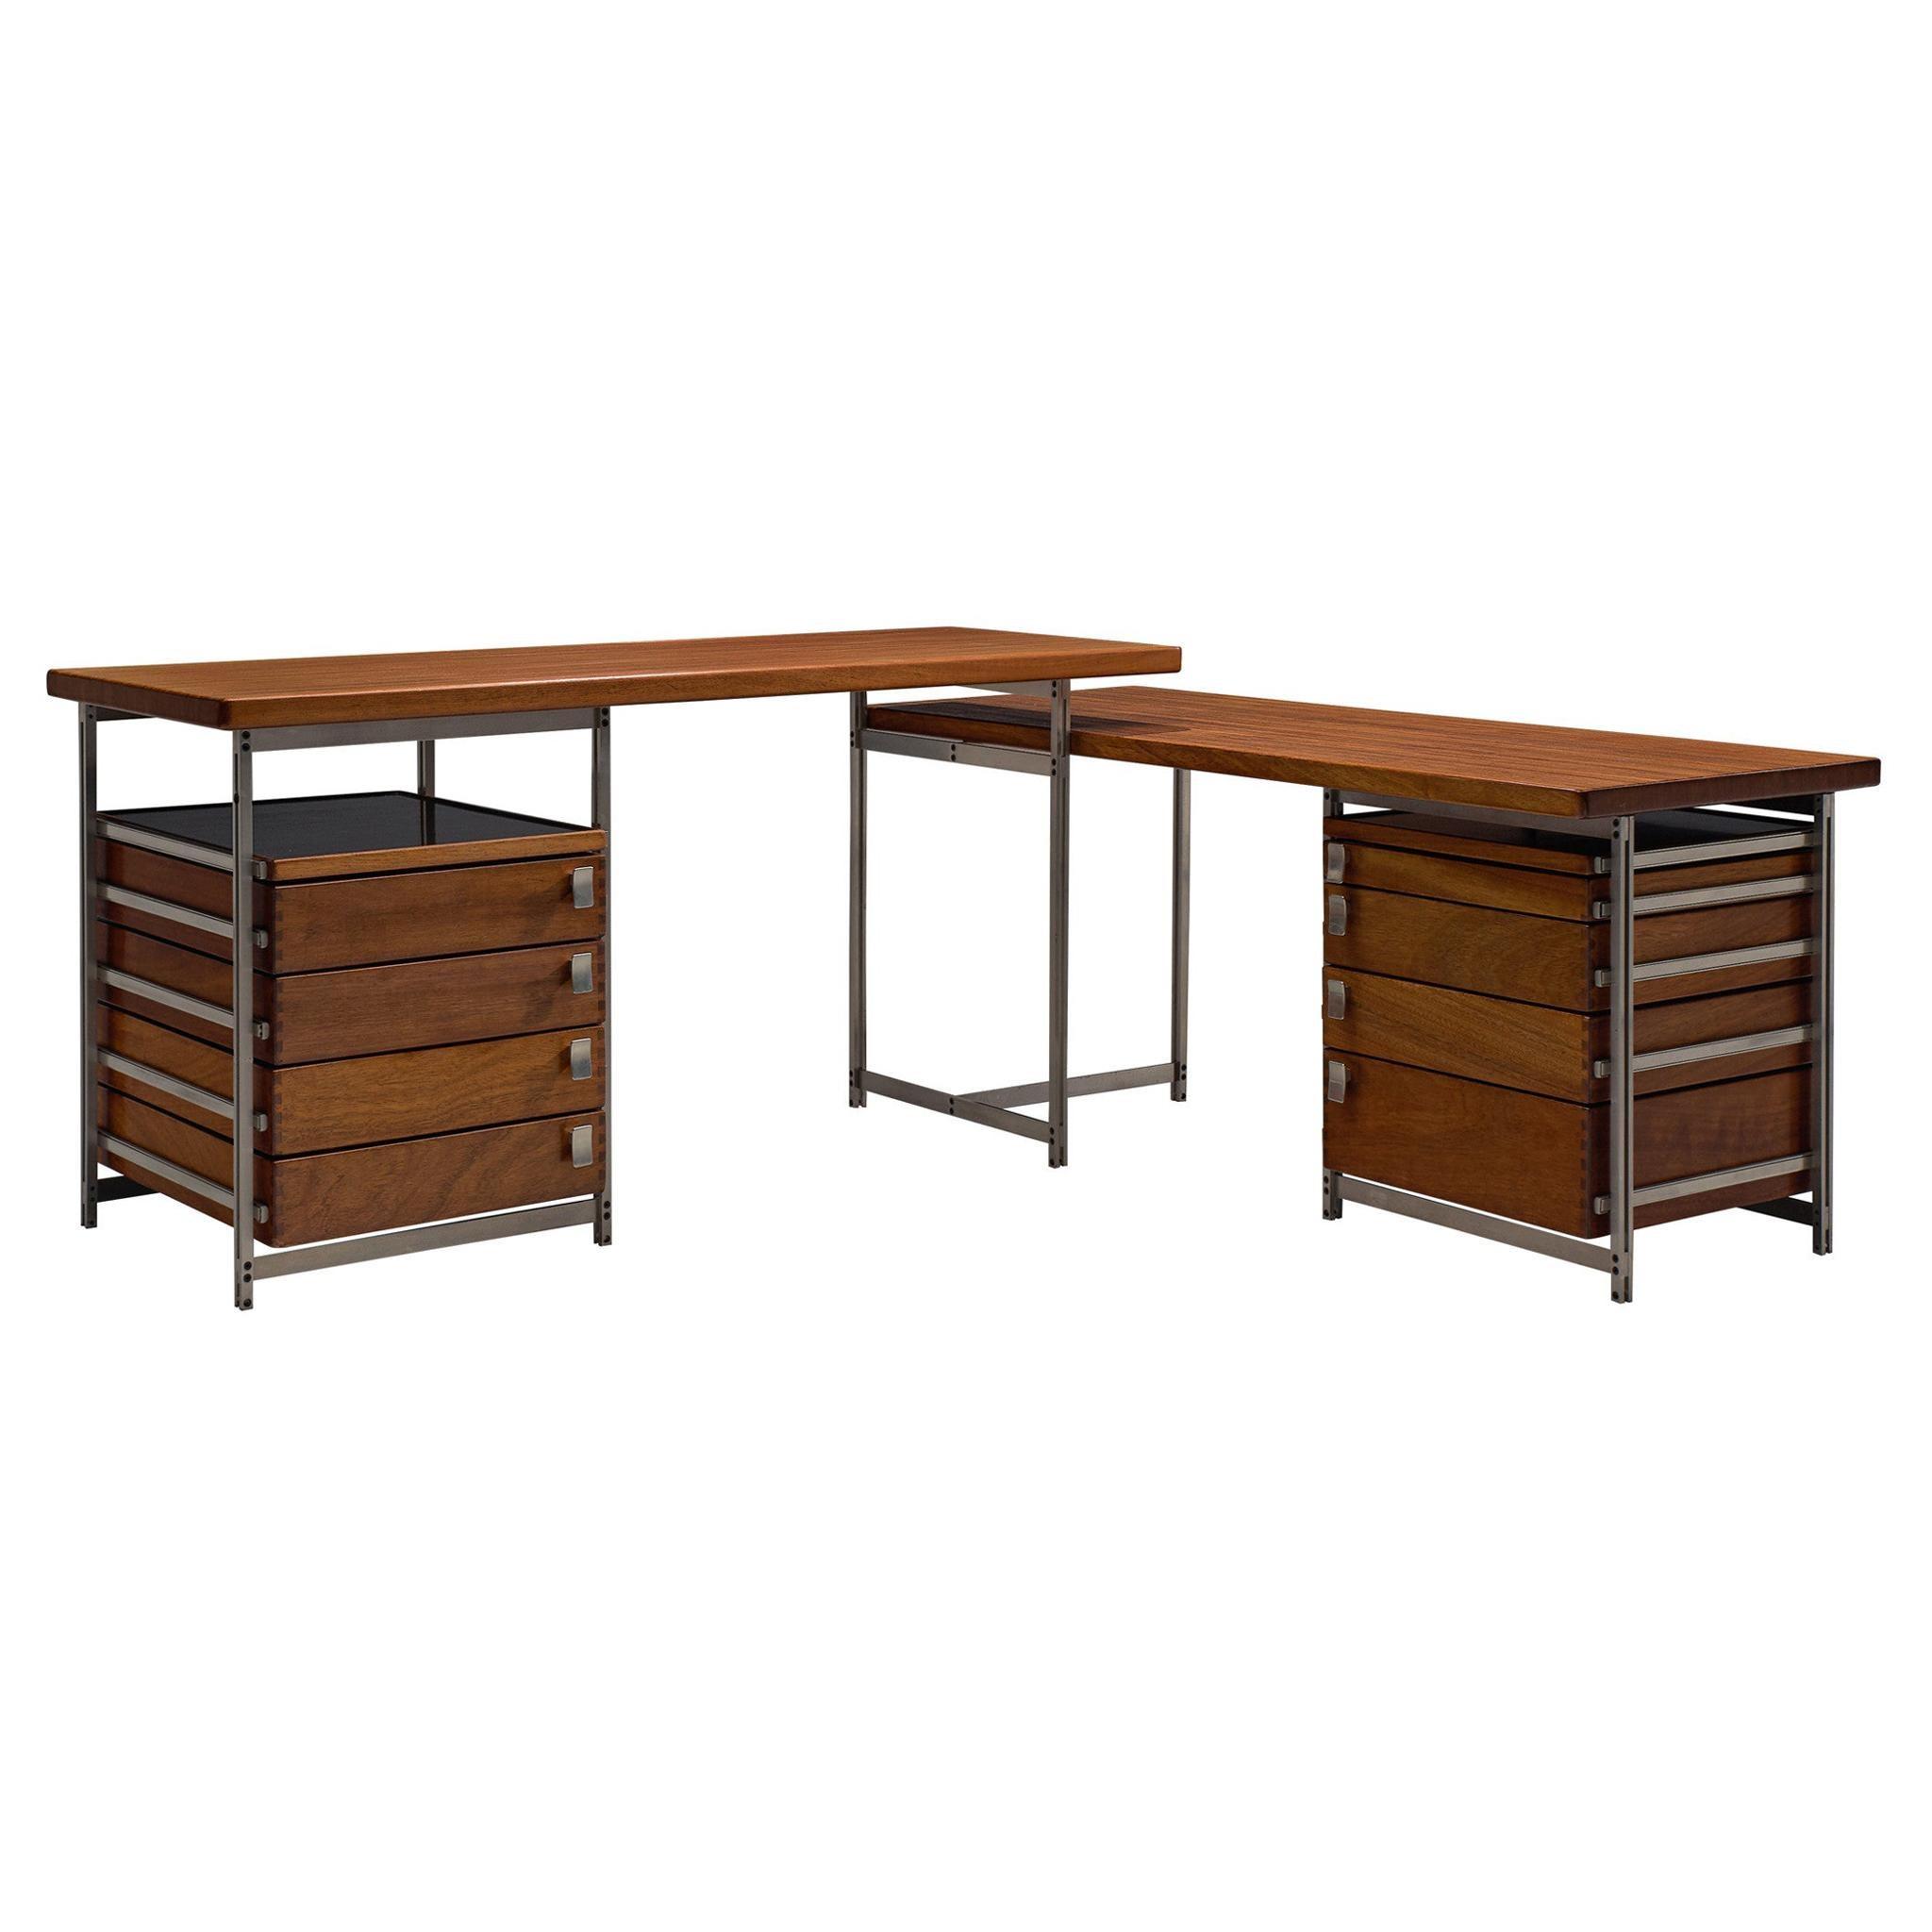 Jules Wabbes Corner Desk with Drawers in Mutenyé